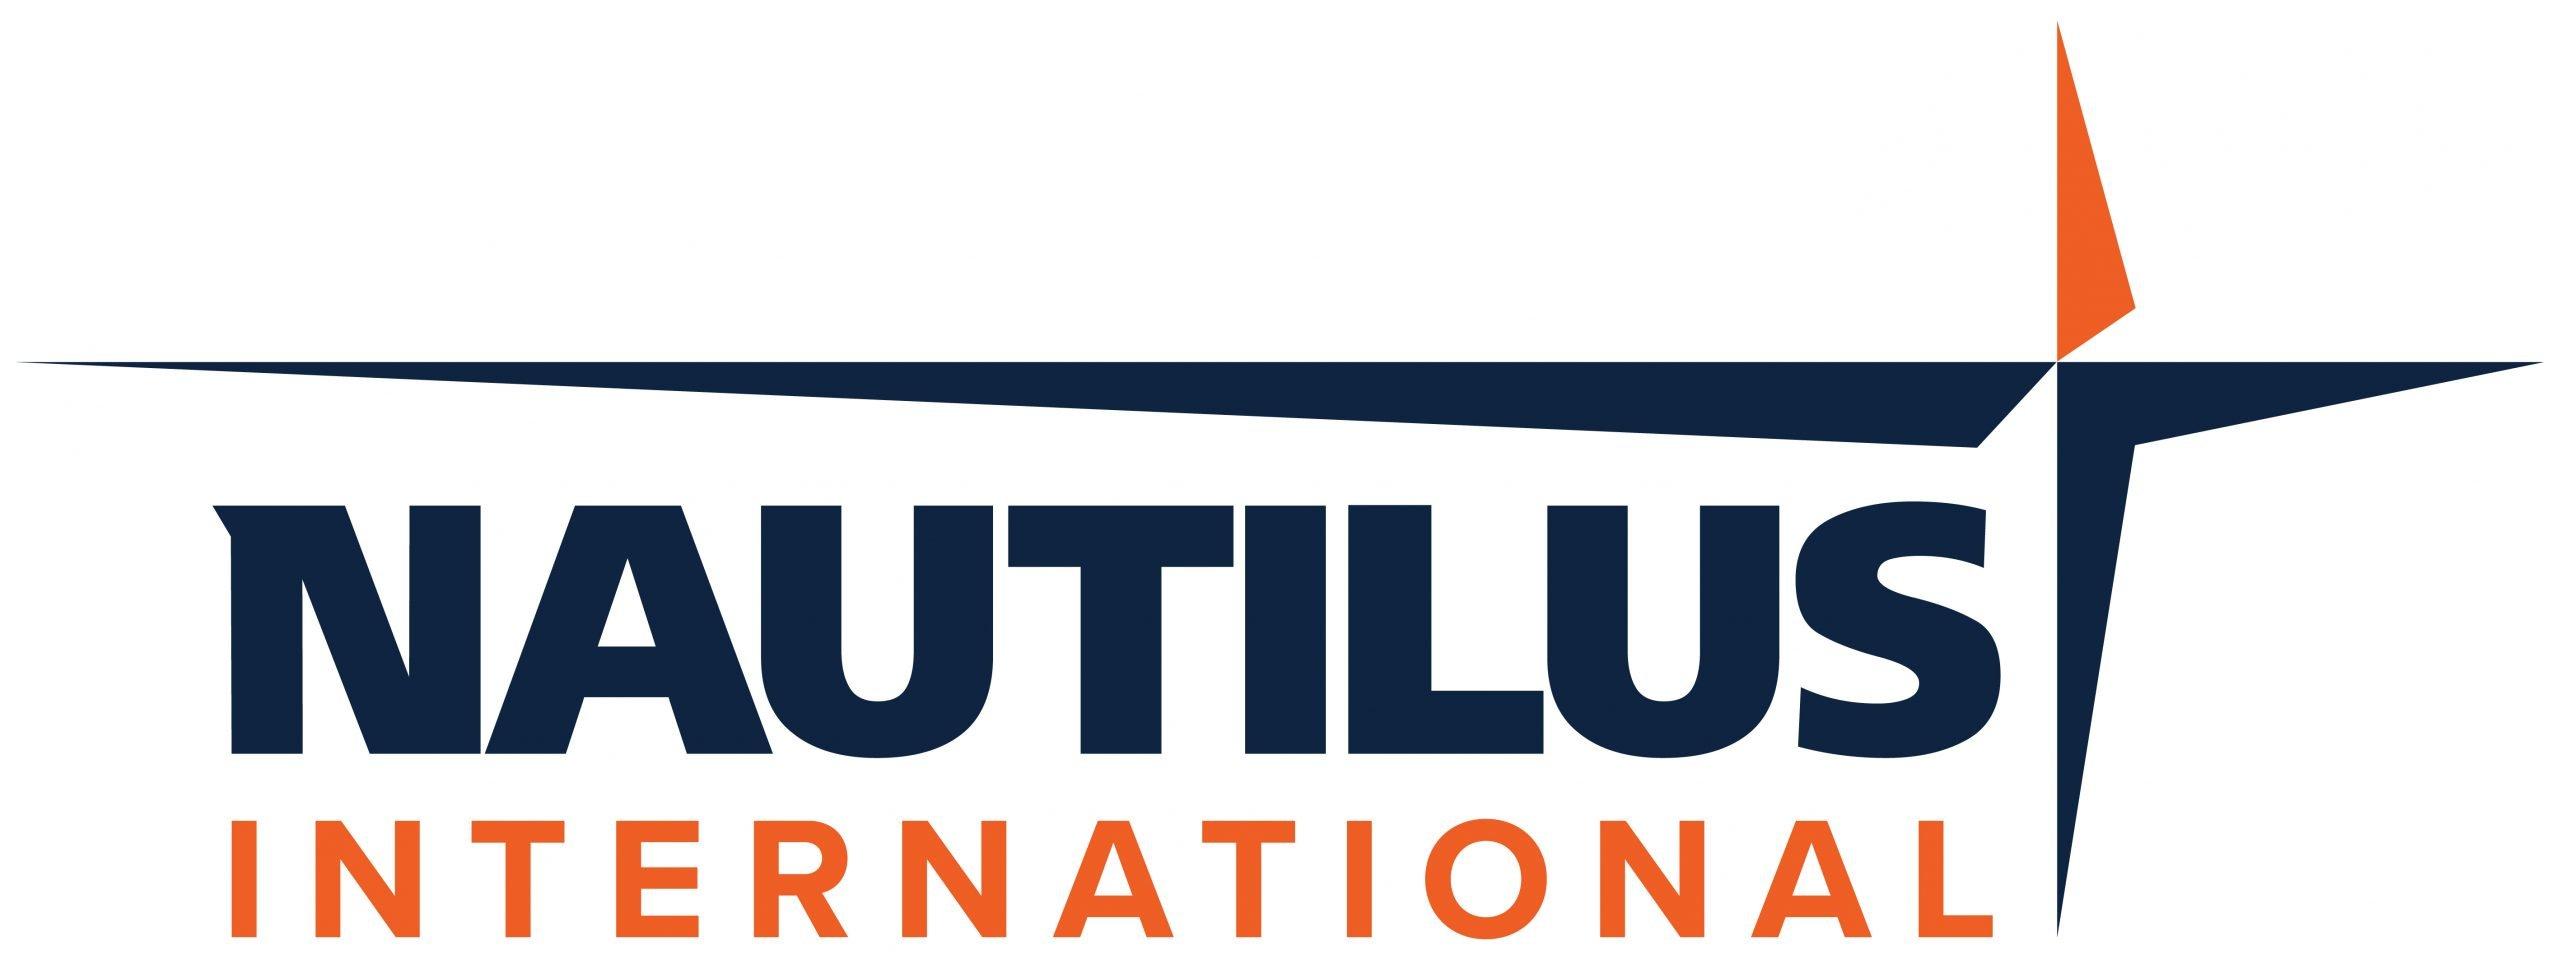 nautilus_international